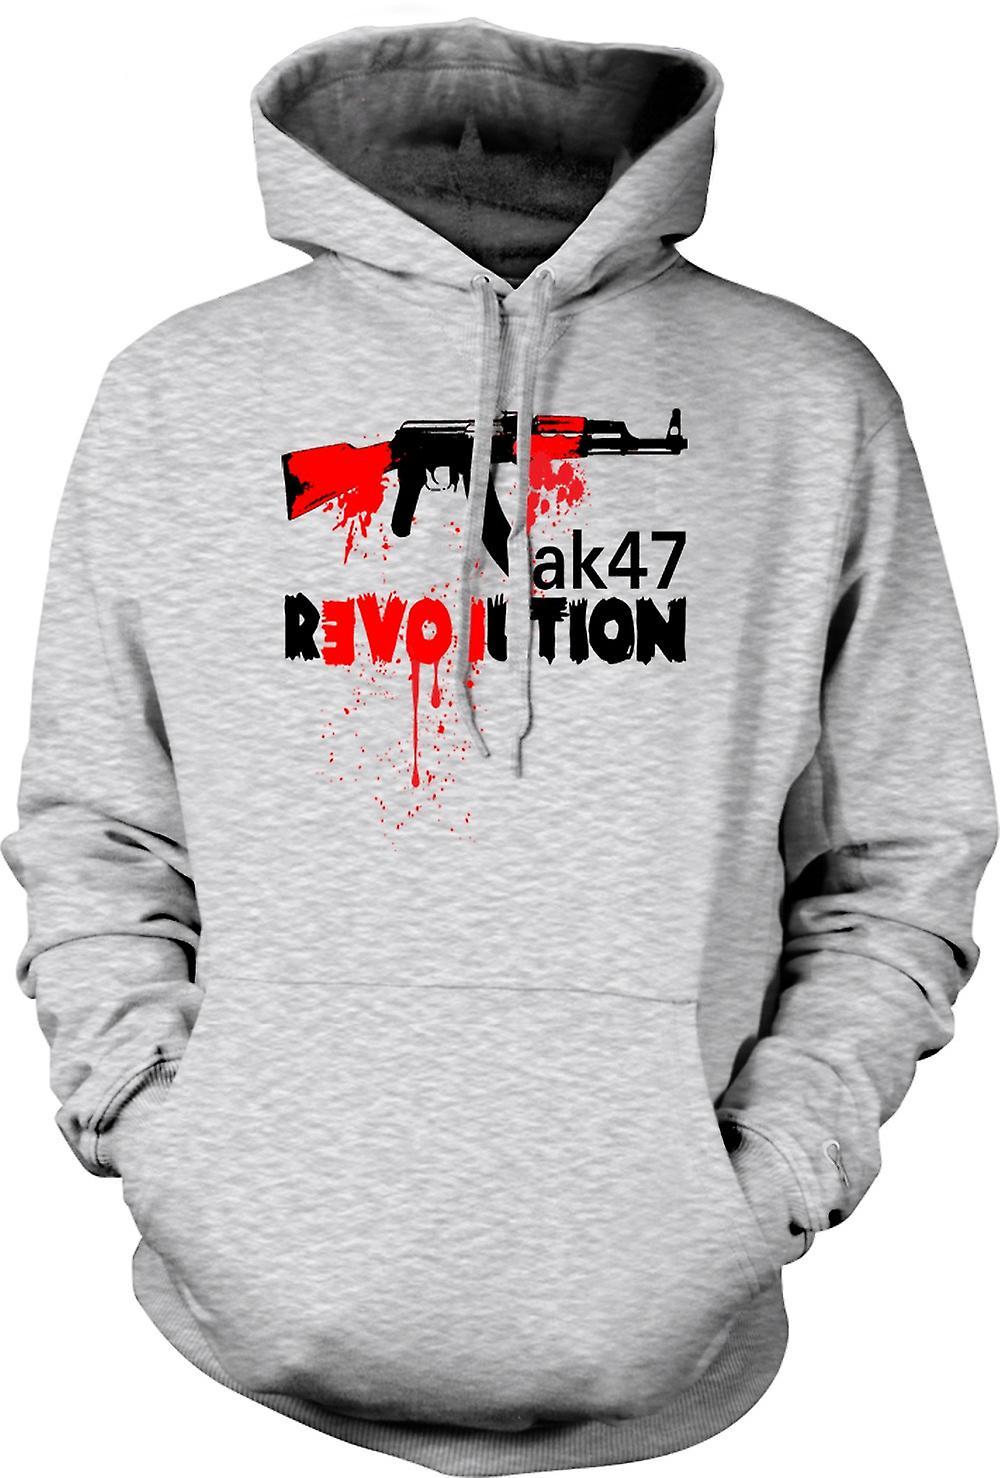 Mens Hoodie - AK47 révolution